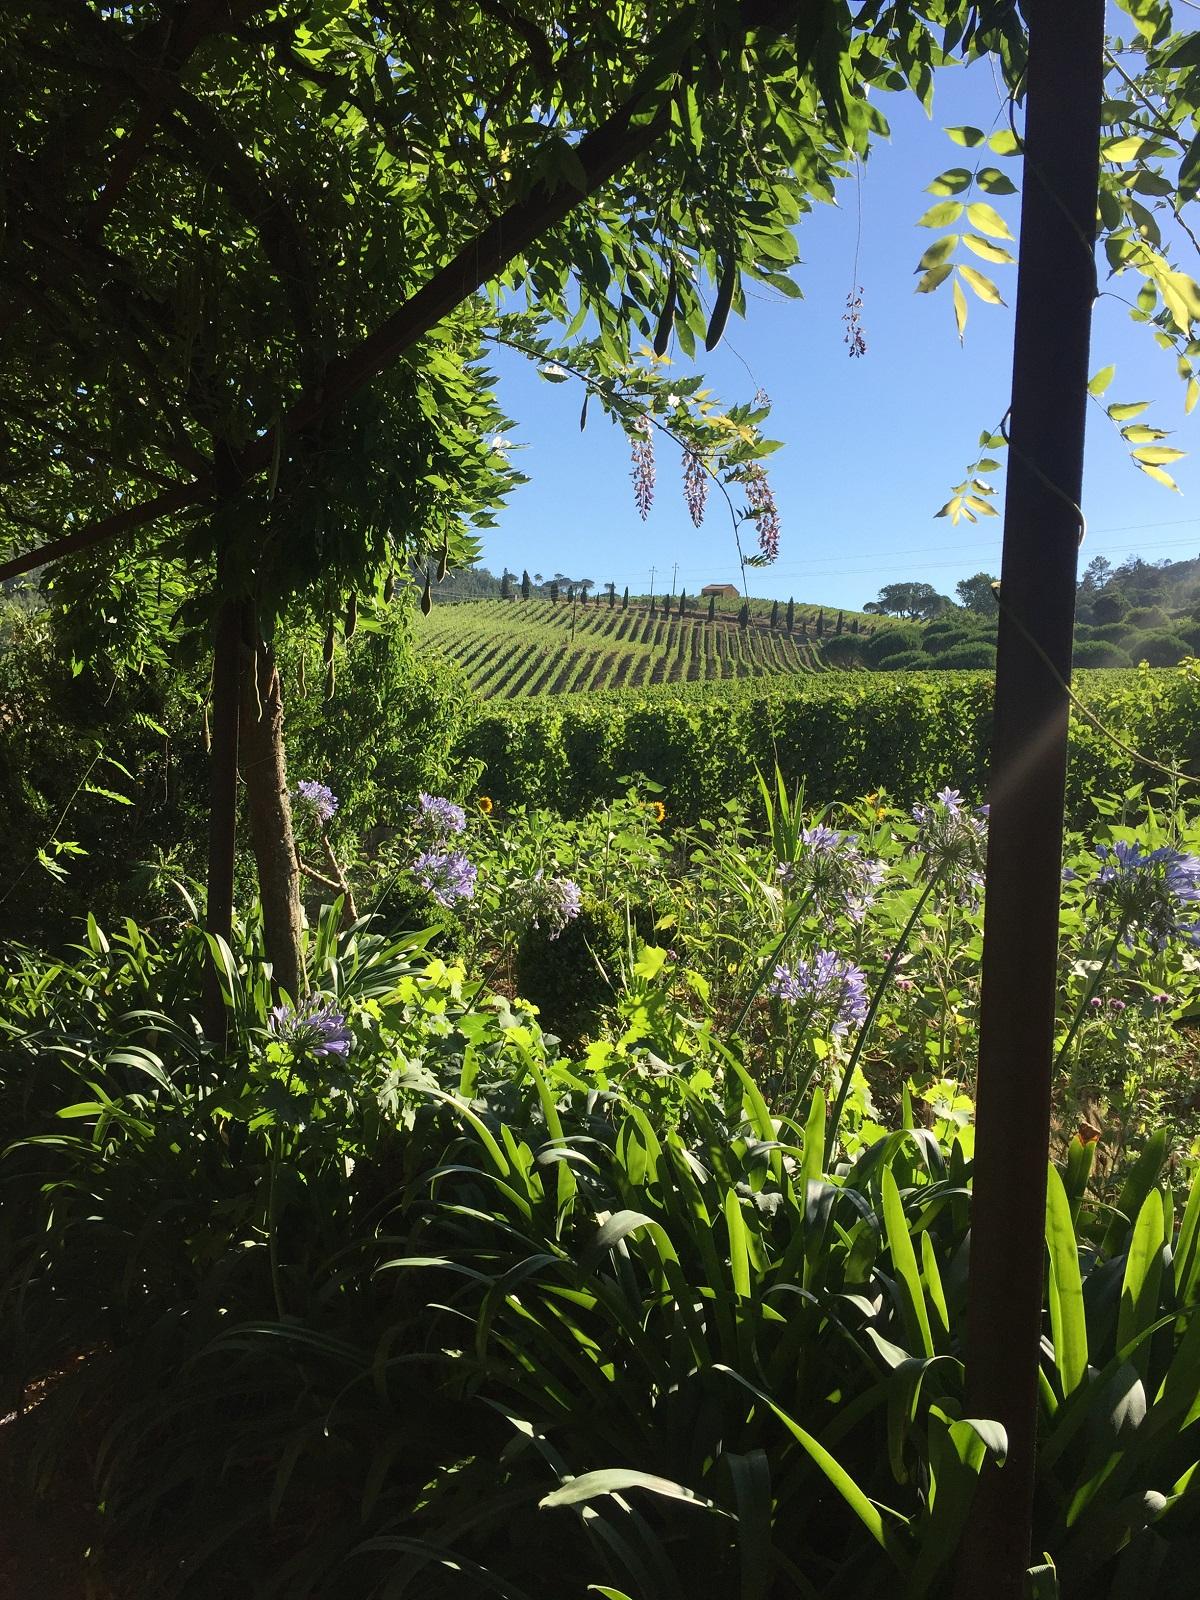 Incentive trip at a vineyard.